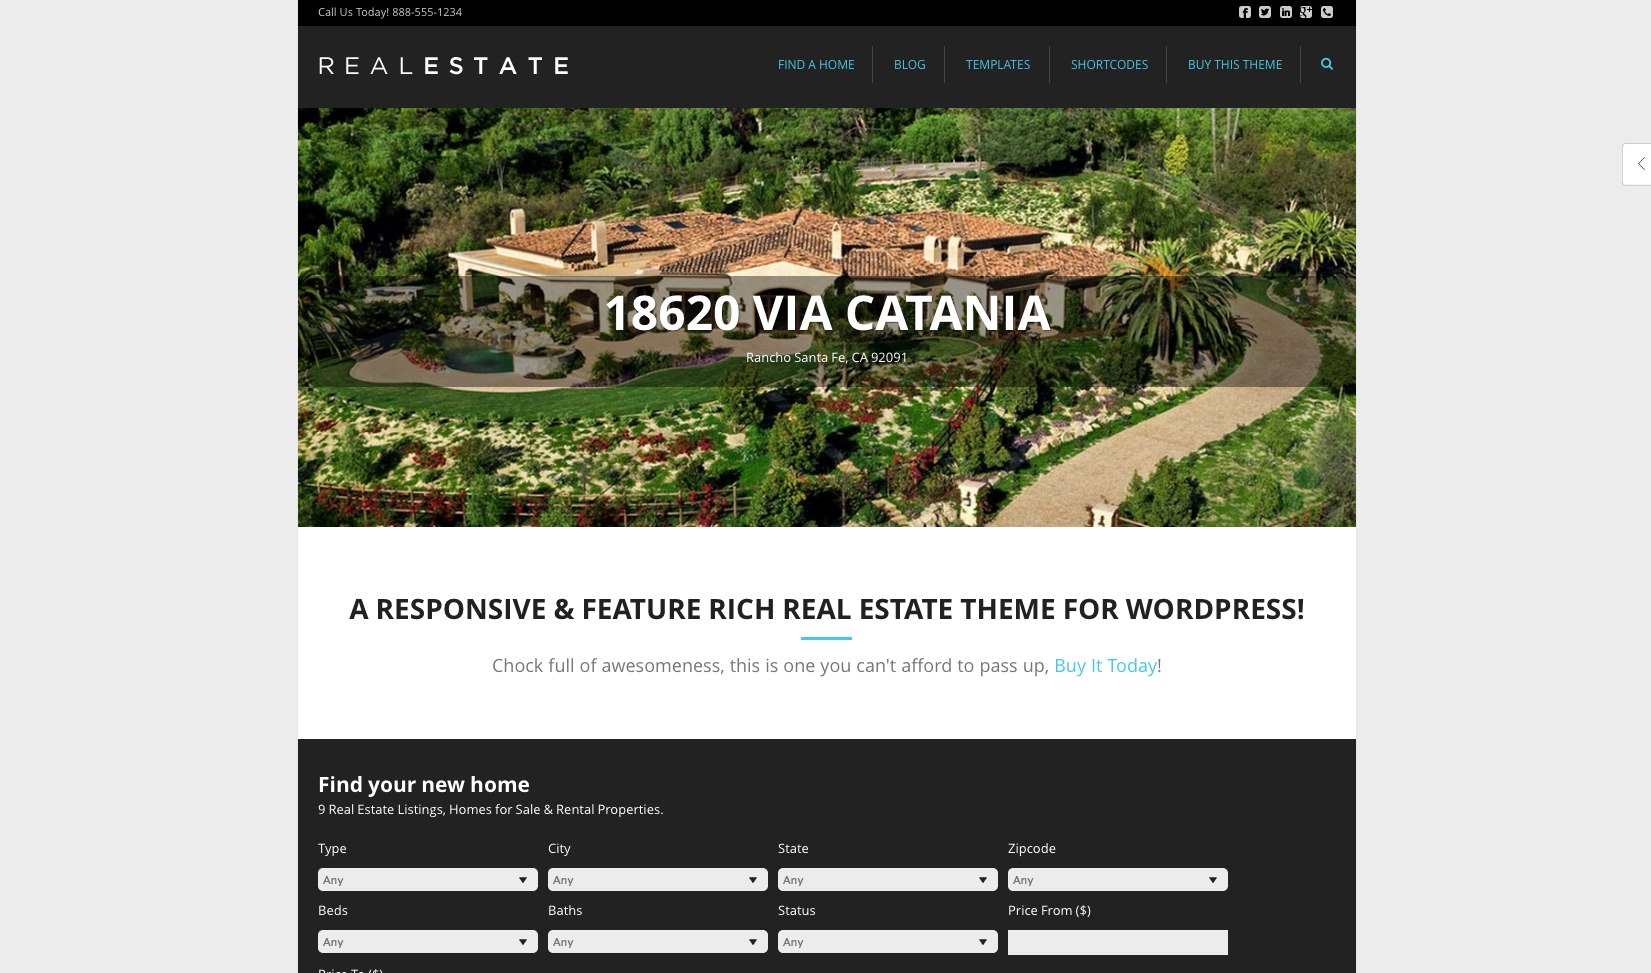 WP Pro Real Estate 5 flat WordPress theme